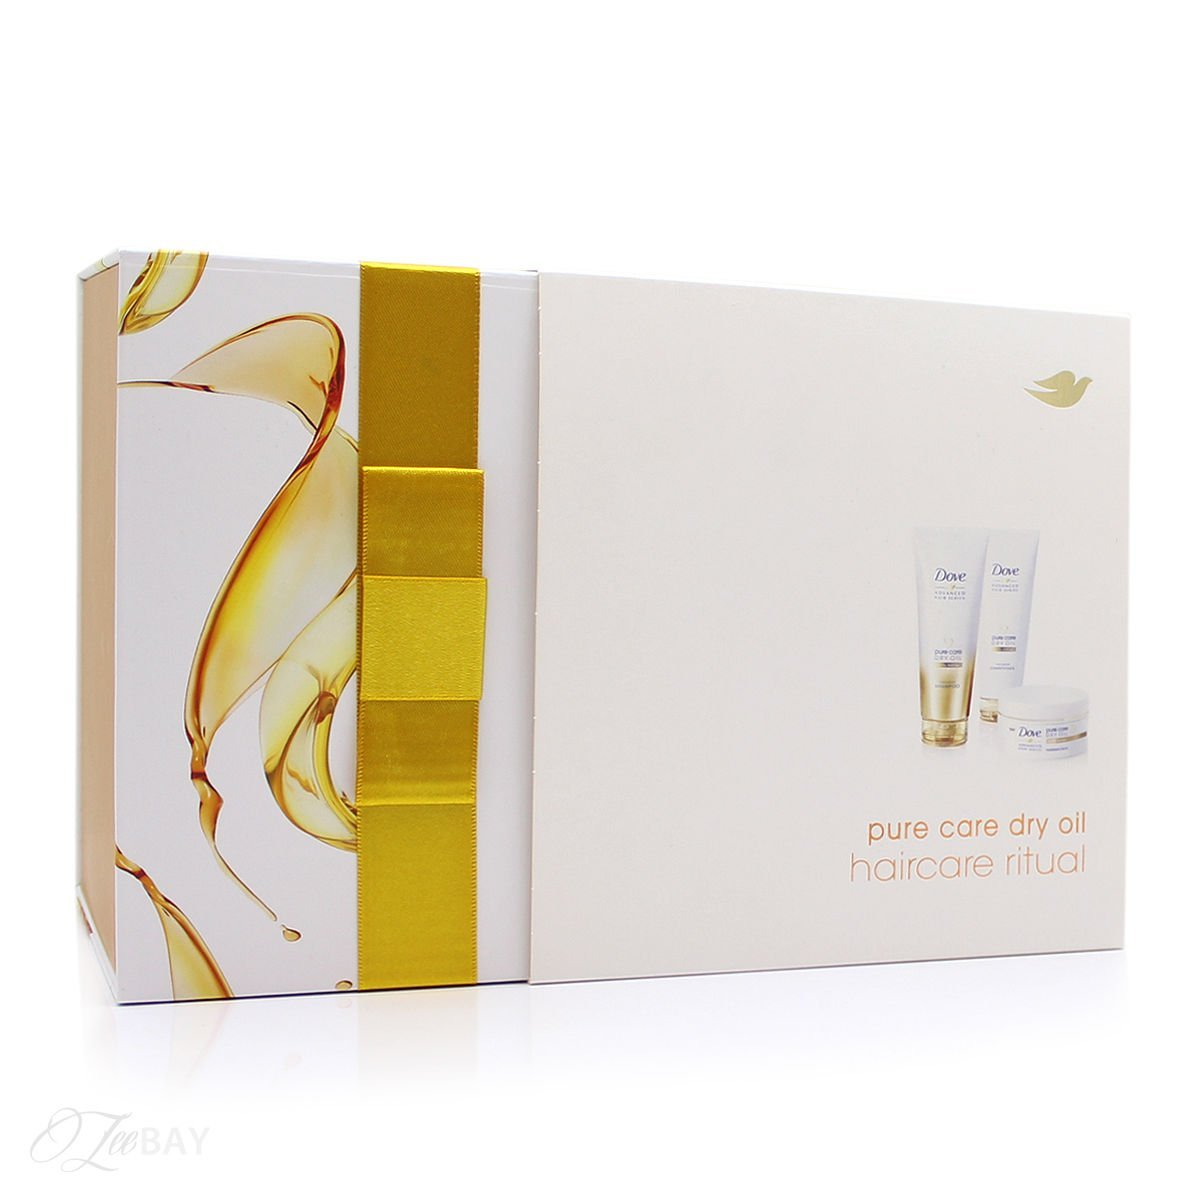 Dove Advanced Hair Series Pure Care Dry OIL Haircare Ritual Premium Gift Box